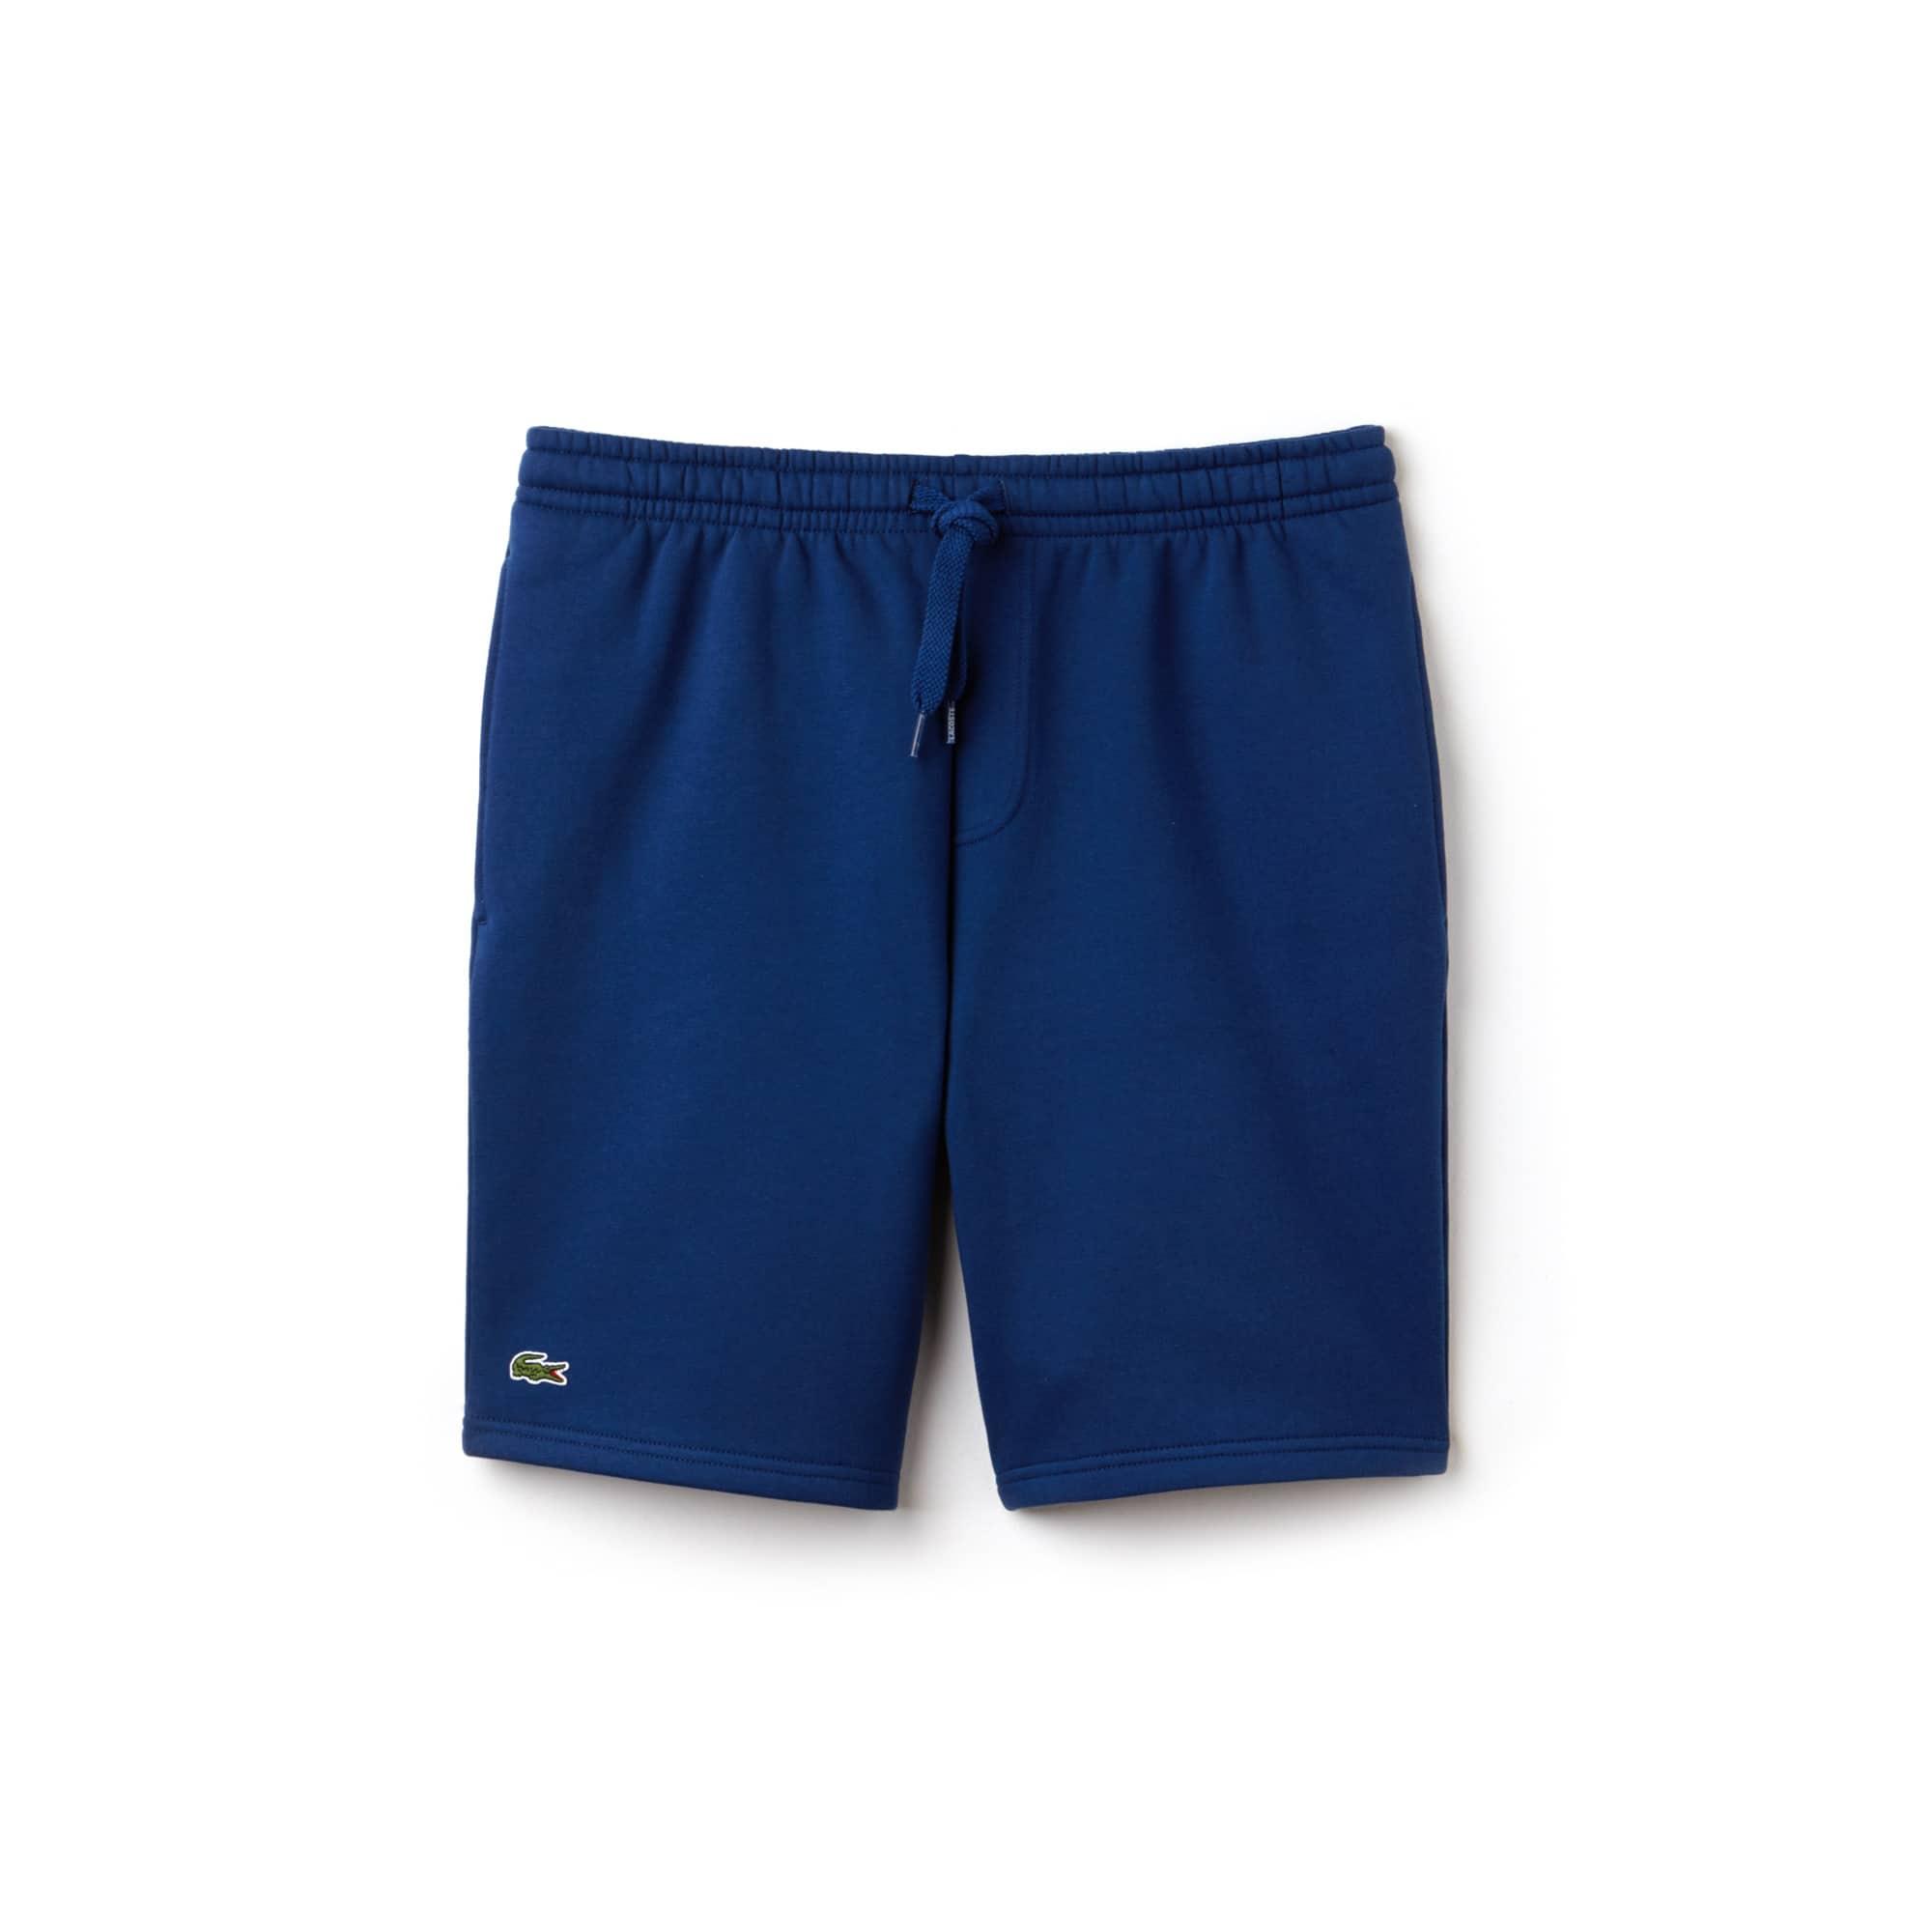 Short Tennis Lacoste SPORT en molleton uni